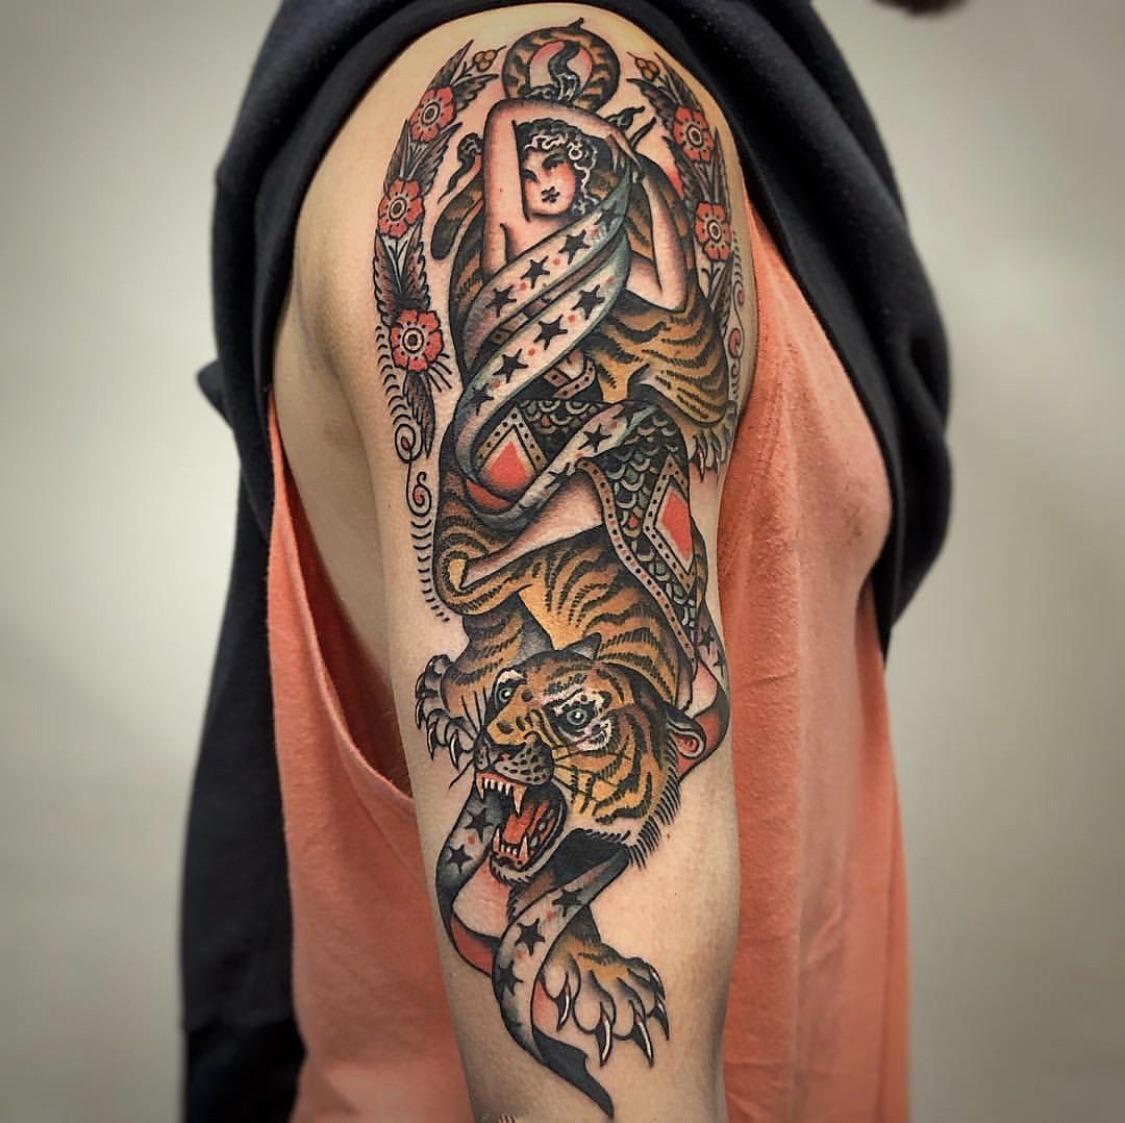 Any traditional tattoo artists similar to rafa decraneo in